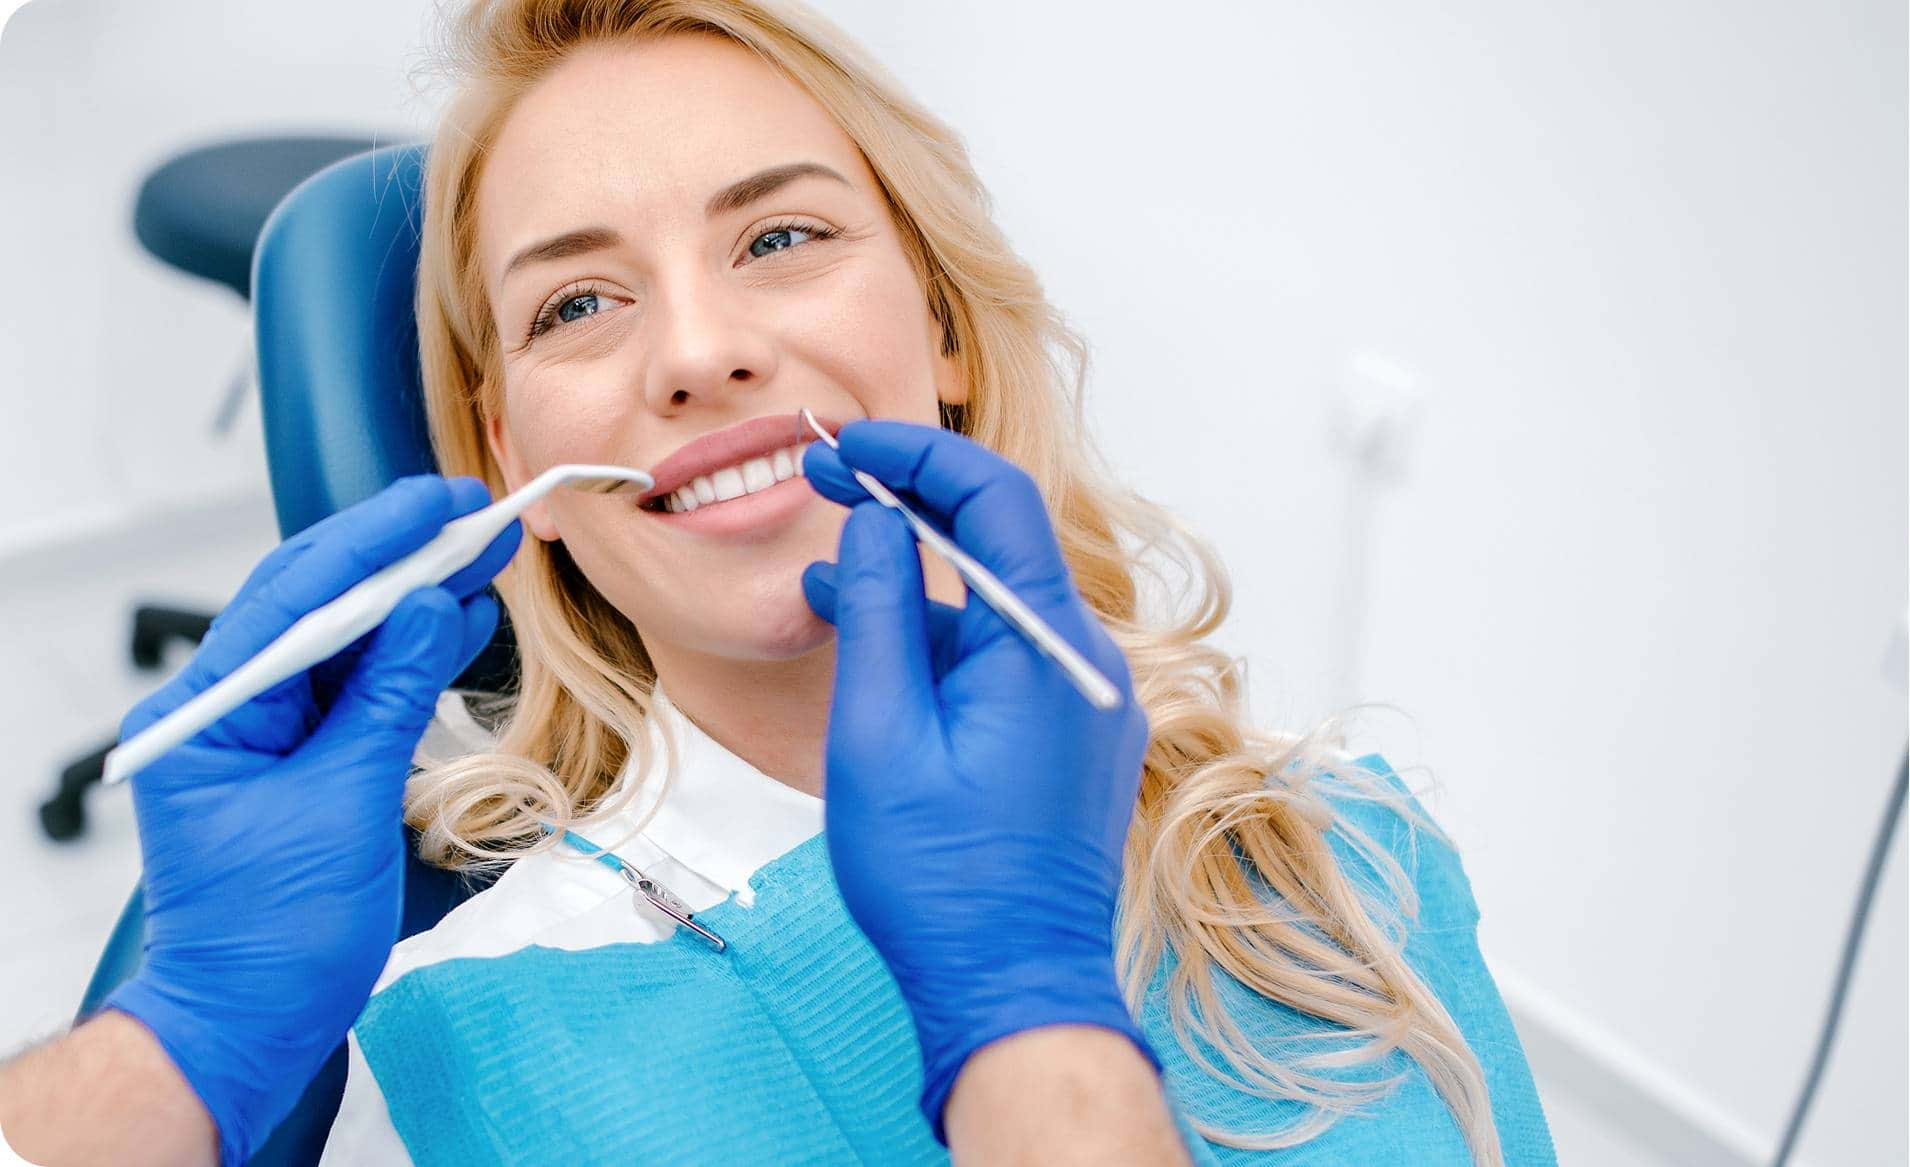 https://www.istockphoto.com/au/photo/woman-having-teeth-examining-at-dentist-gm1190798549-337690744